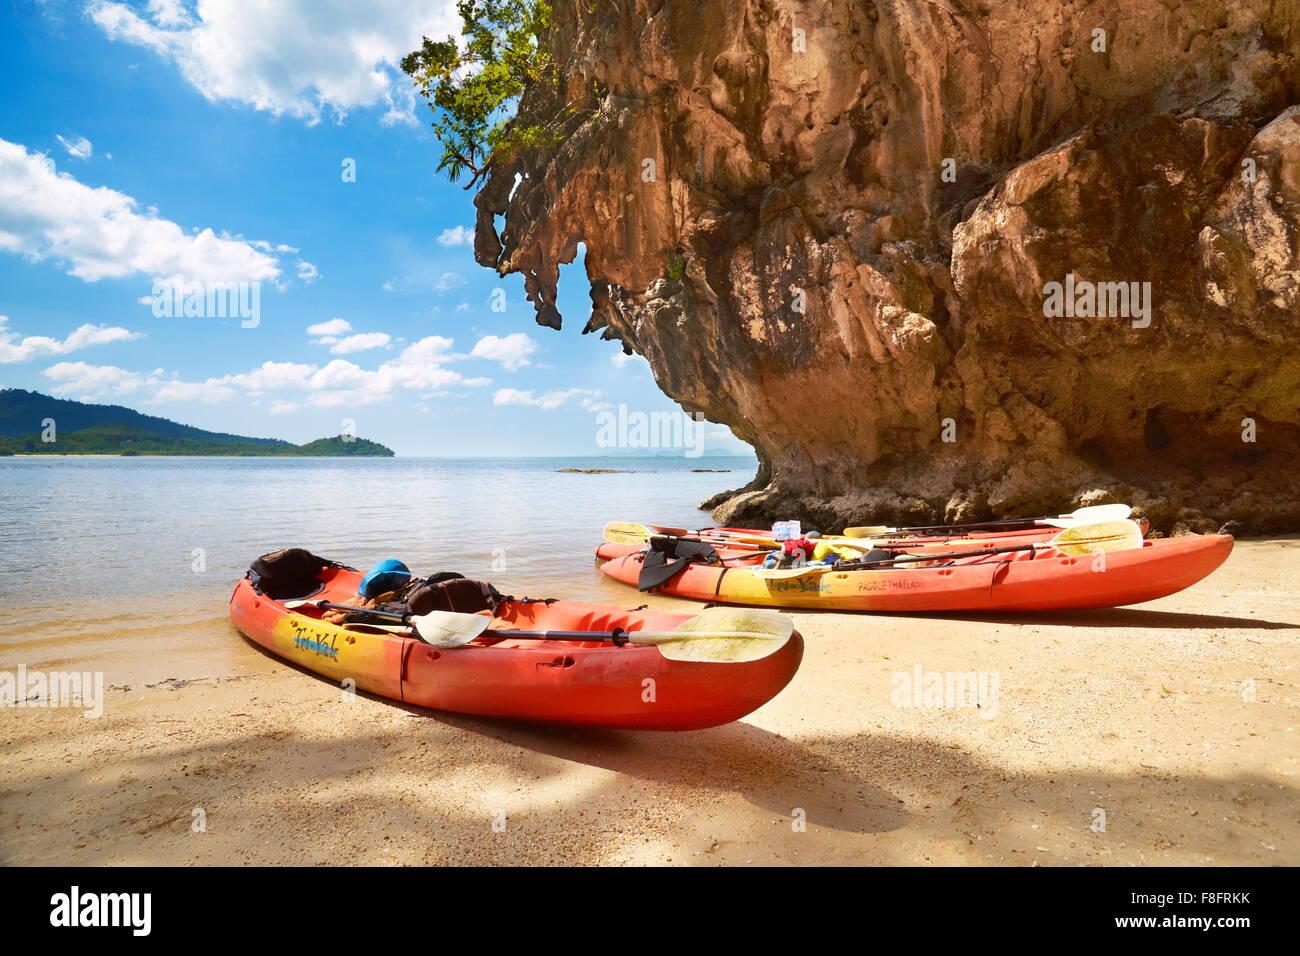 Thaïlande - Baie de Phang Nga paysage, voyage de canoë Photo Stock